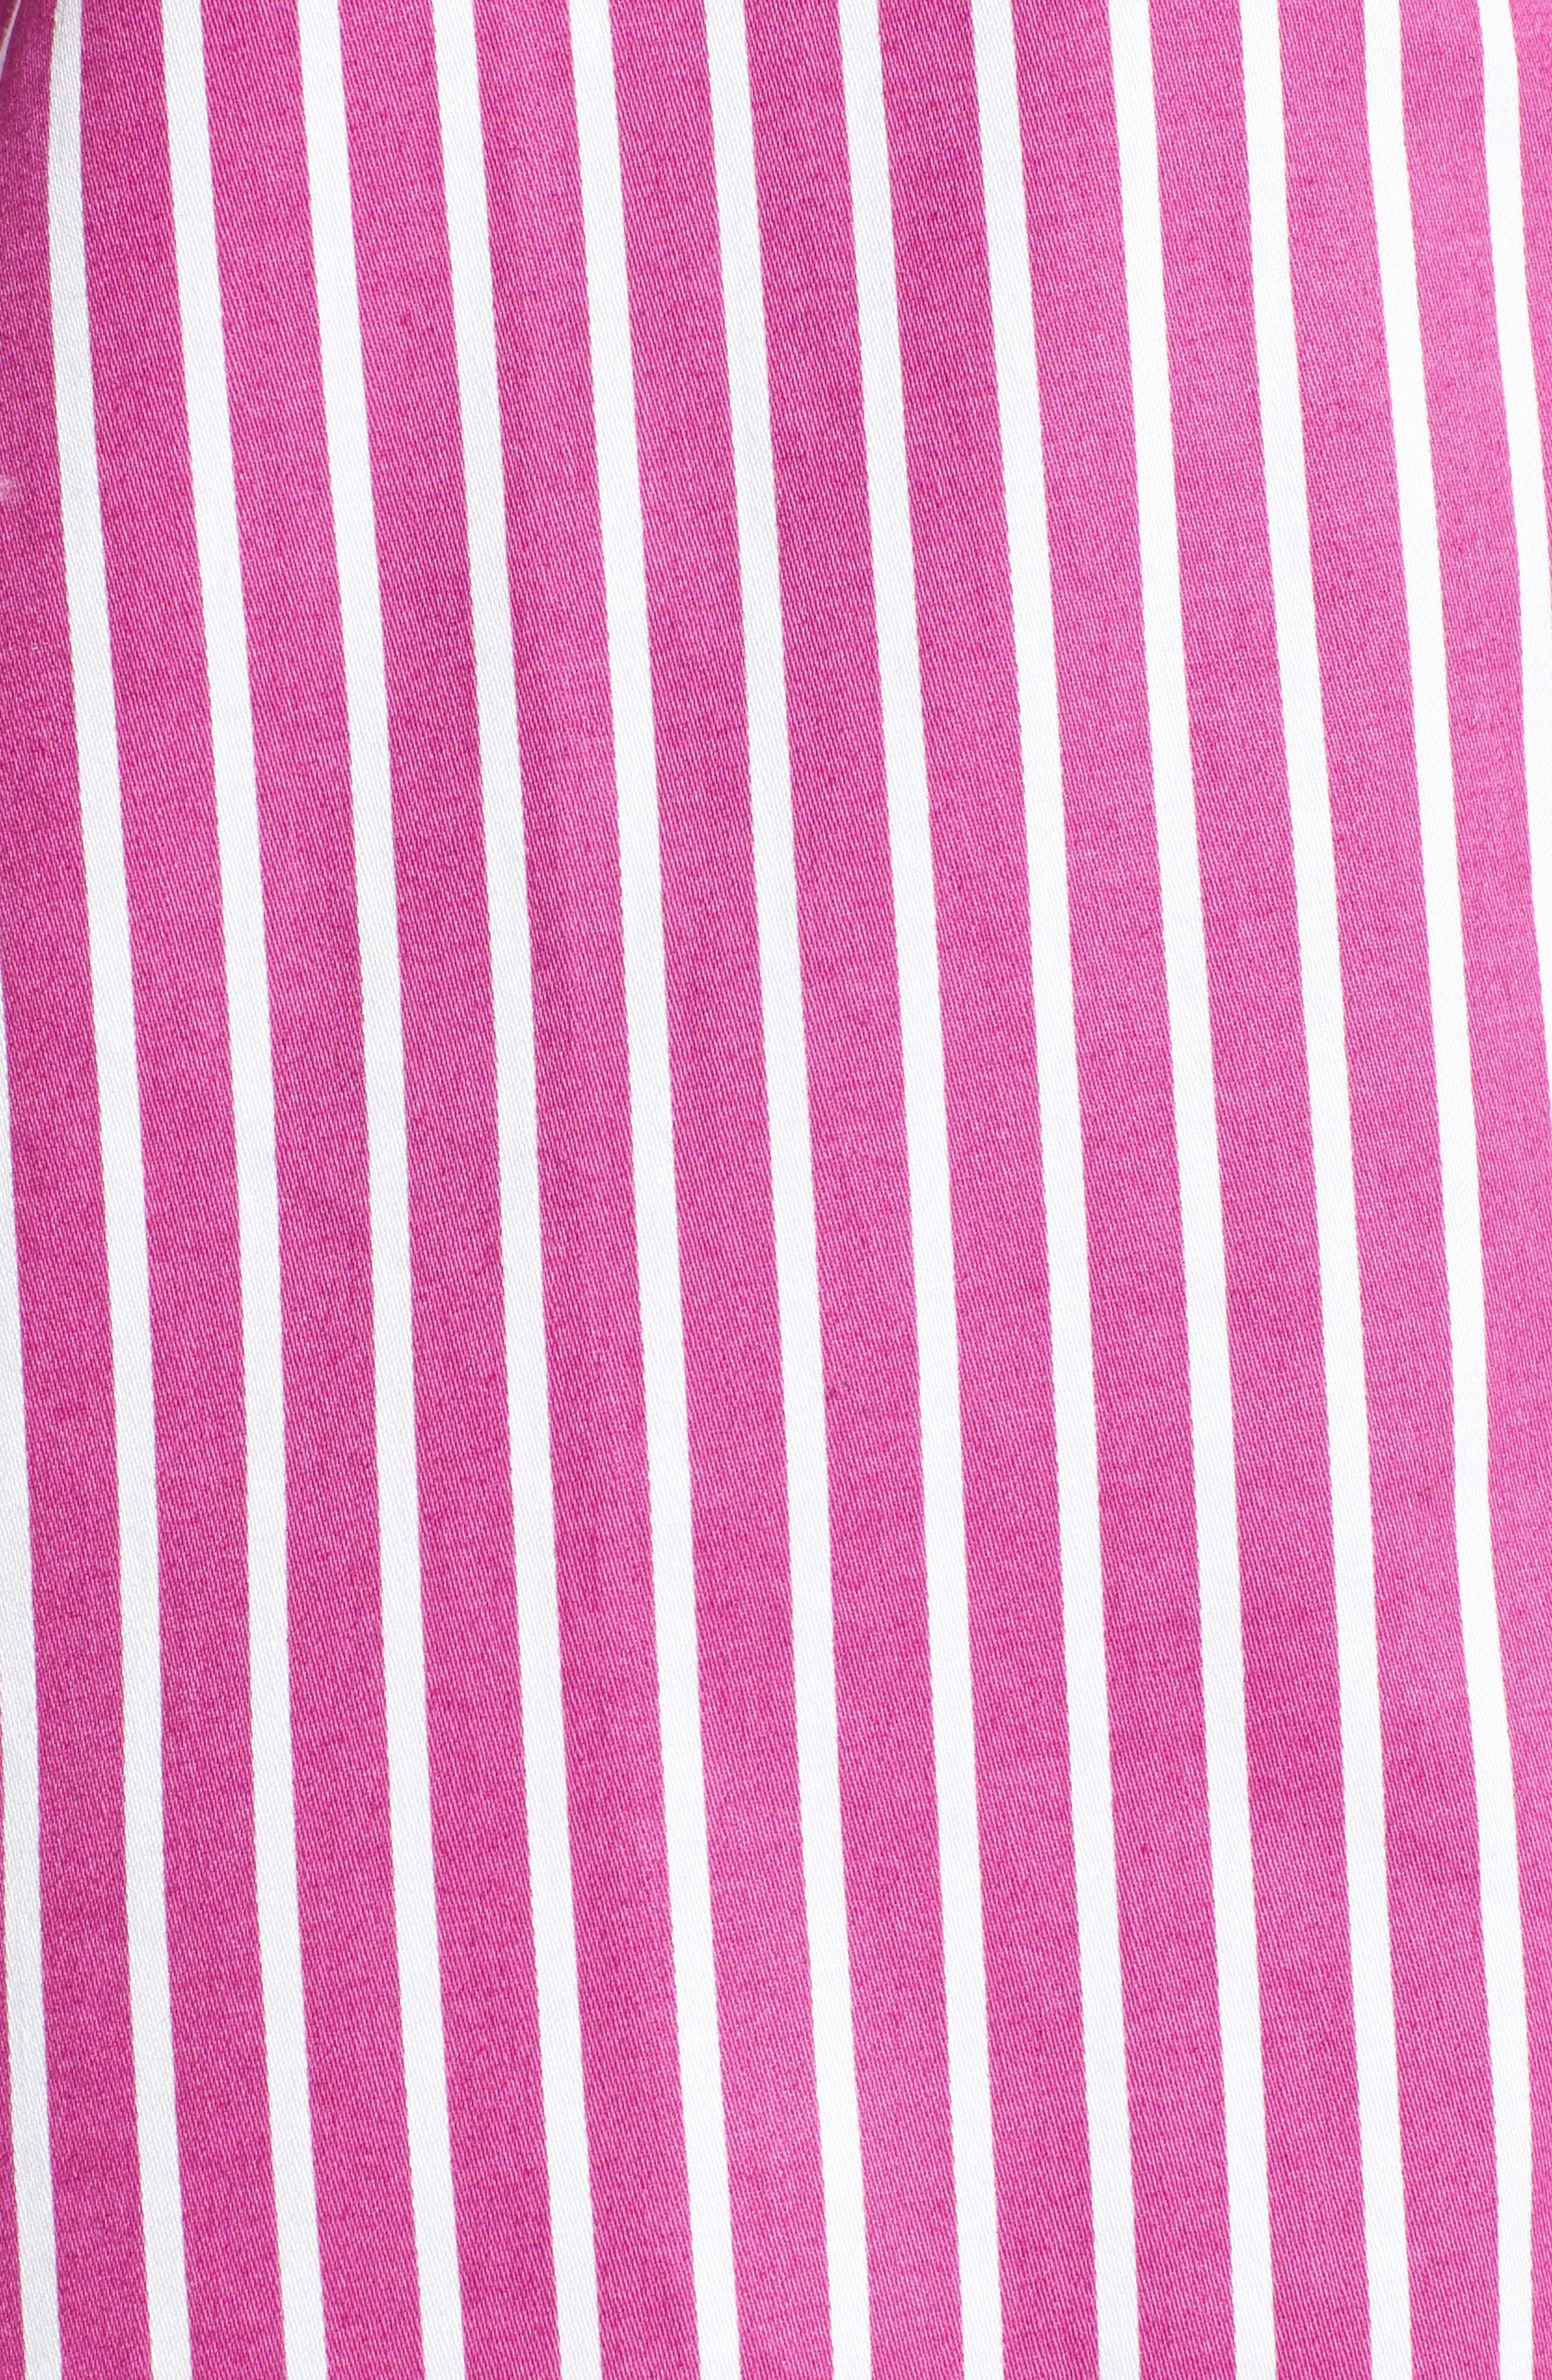 Sleep Shirt,                             Alternate thumbnail 5, color,                             Pink/ White Stripe